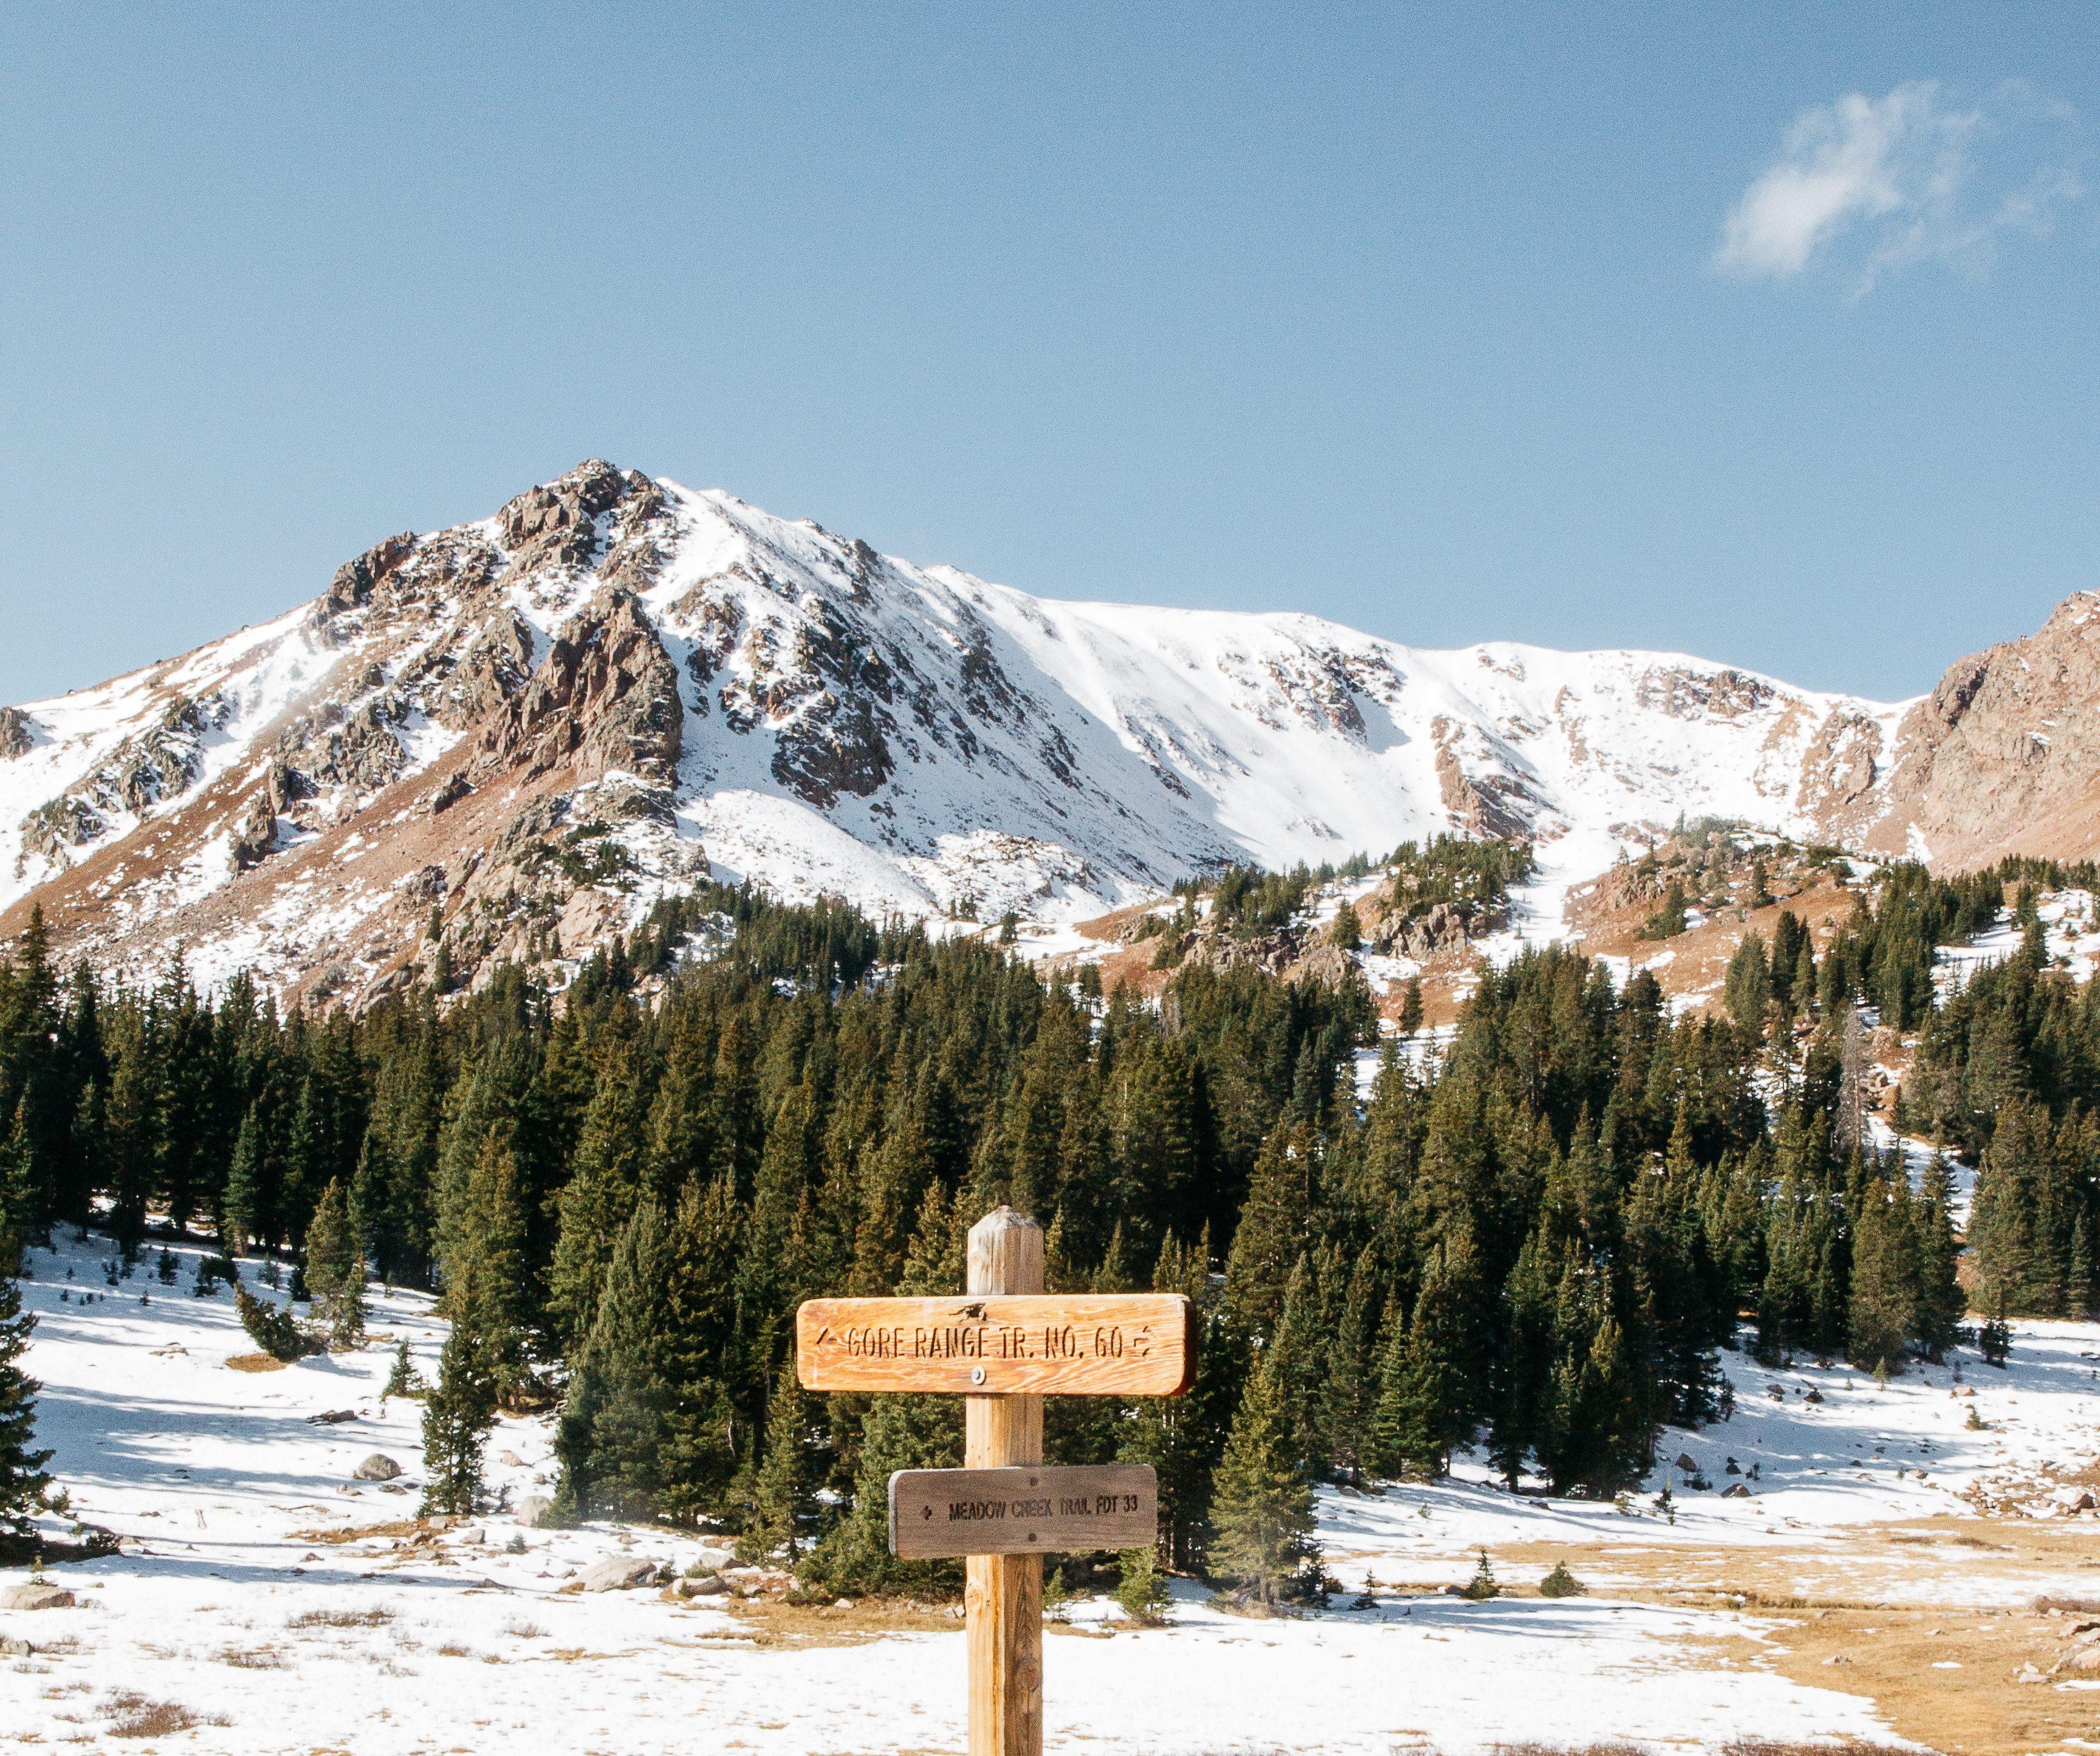 Walking in Colorado mountains to unplug.